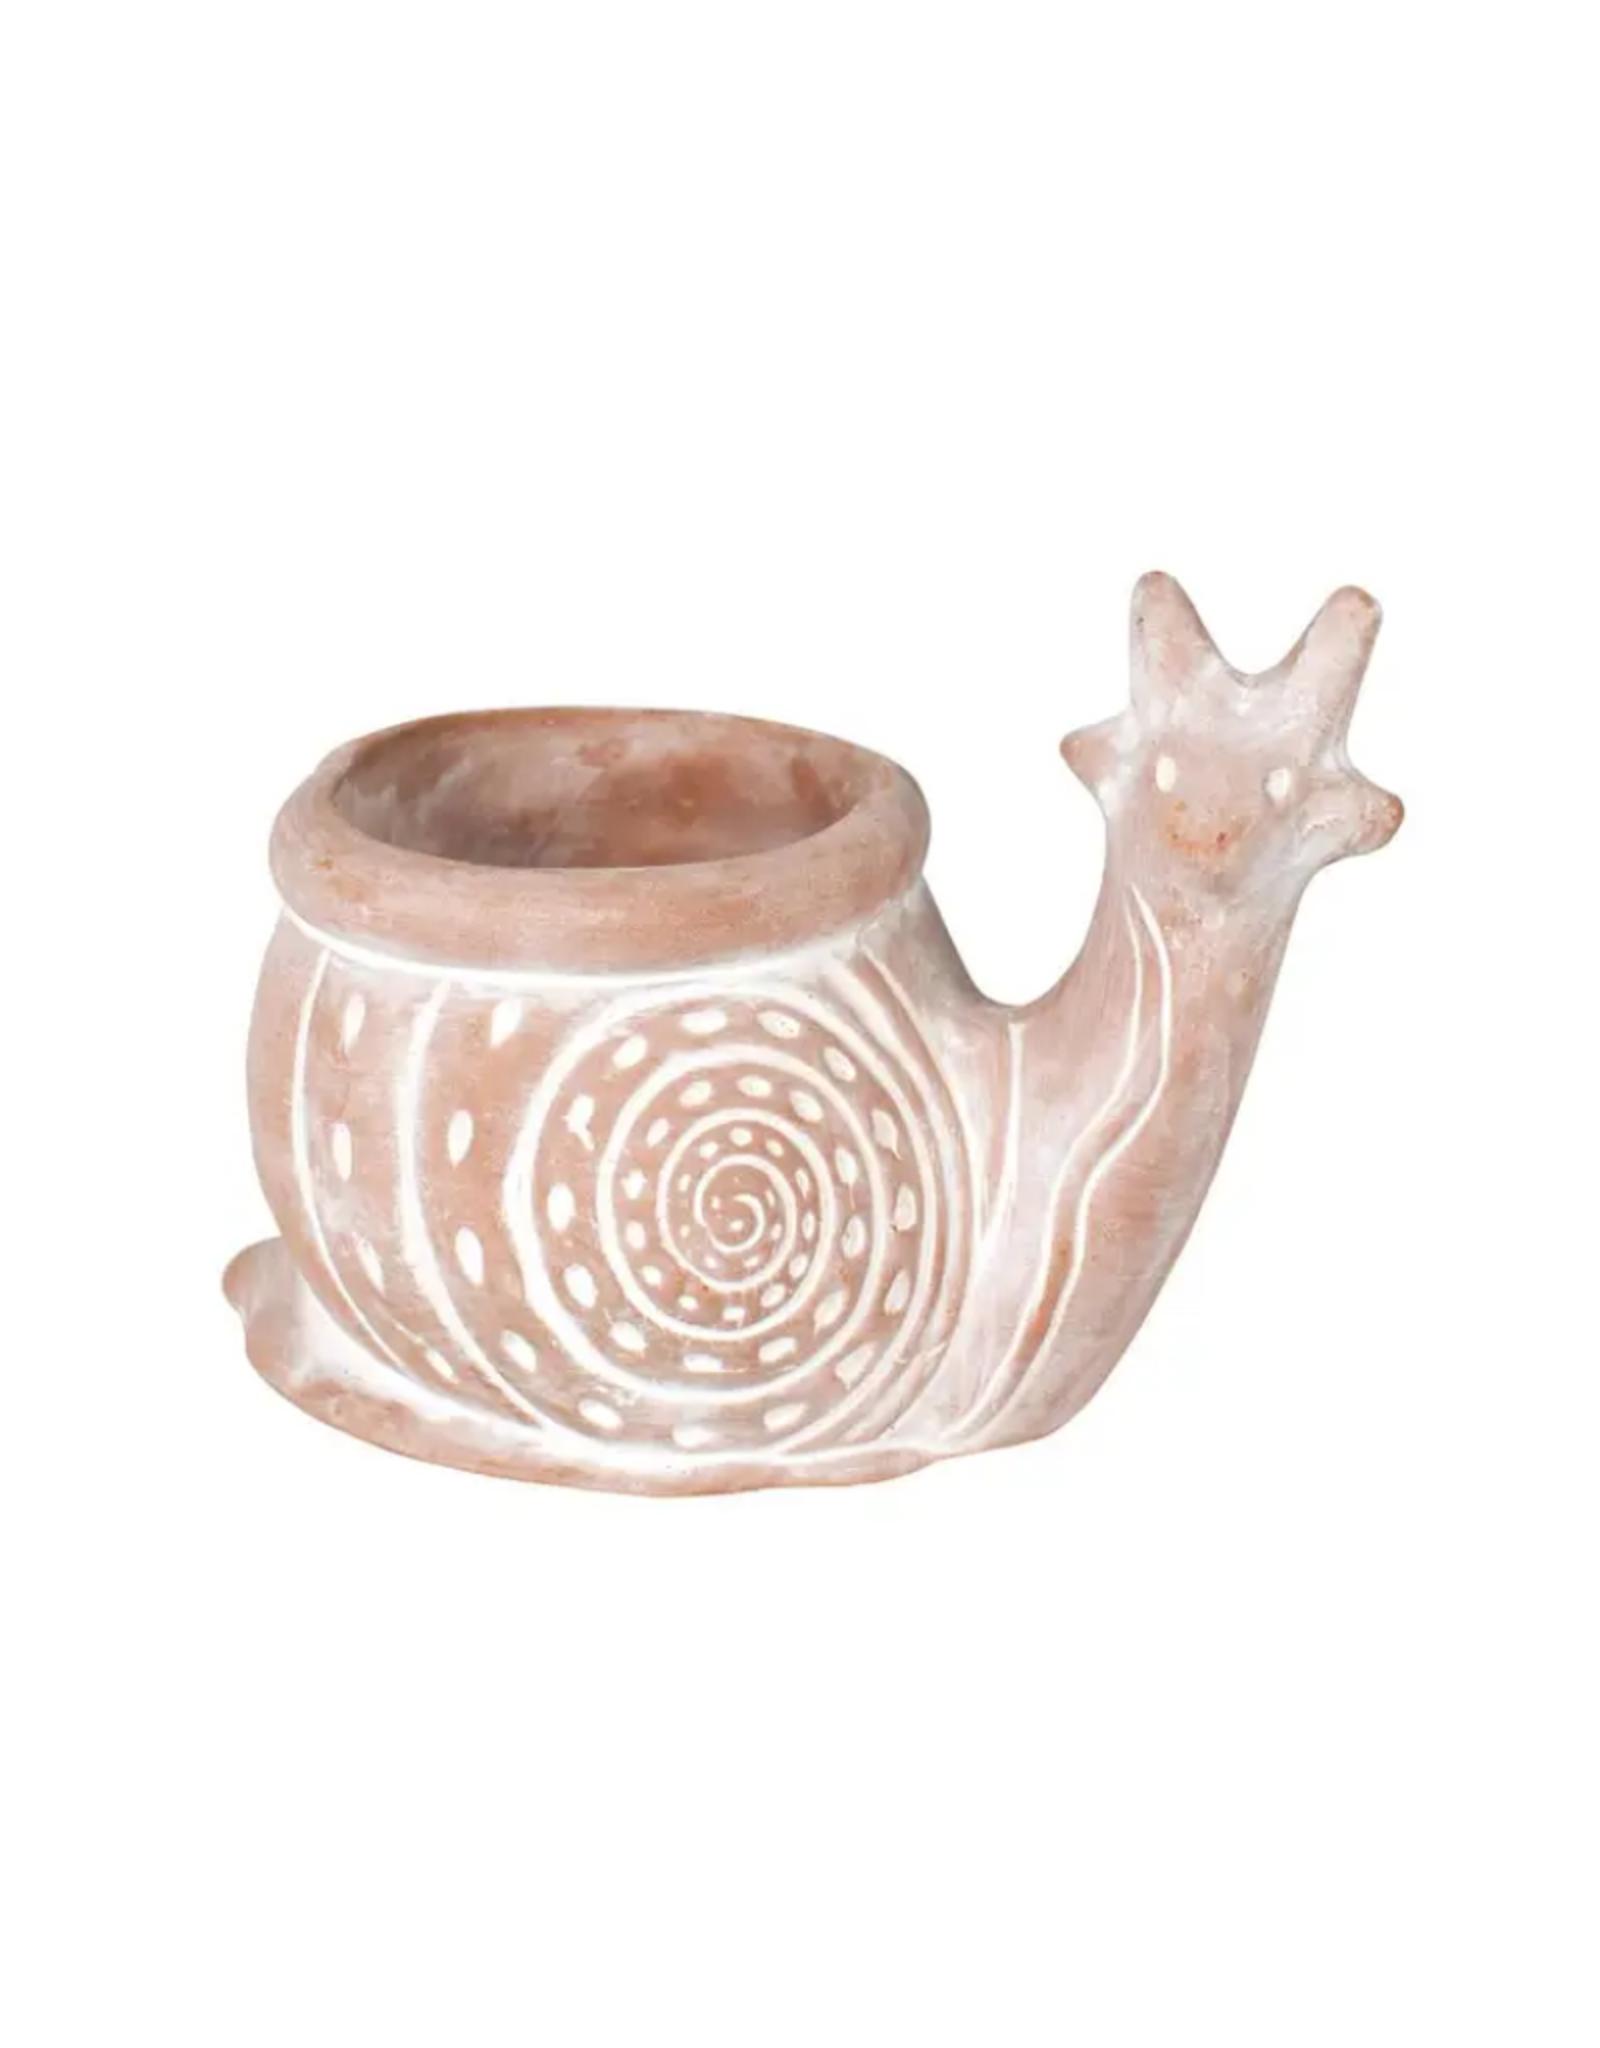 TTV USA Planter, Snail Terracotta